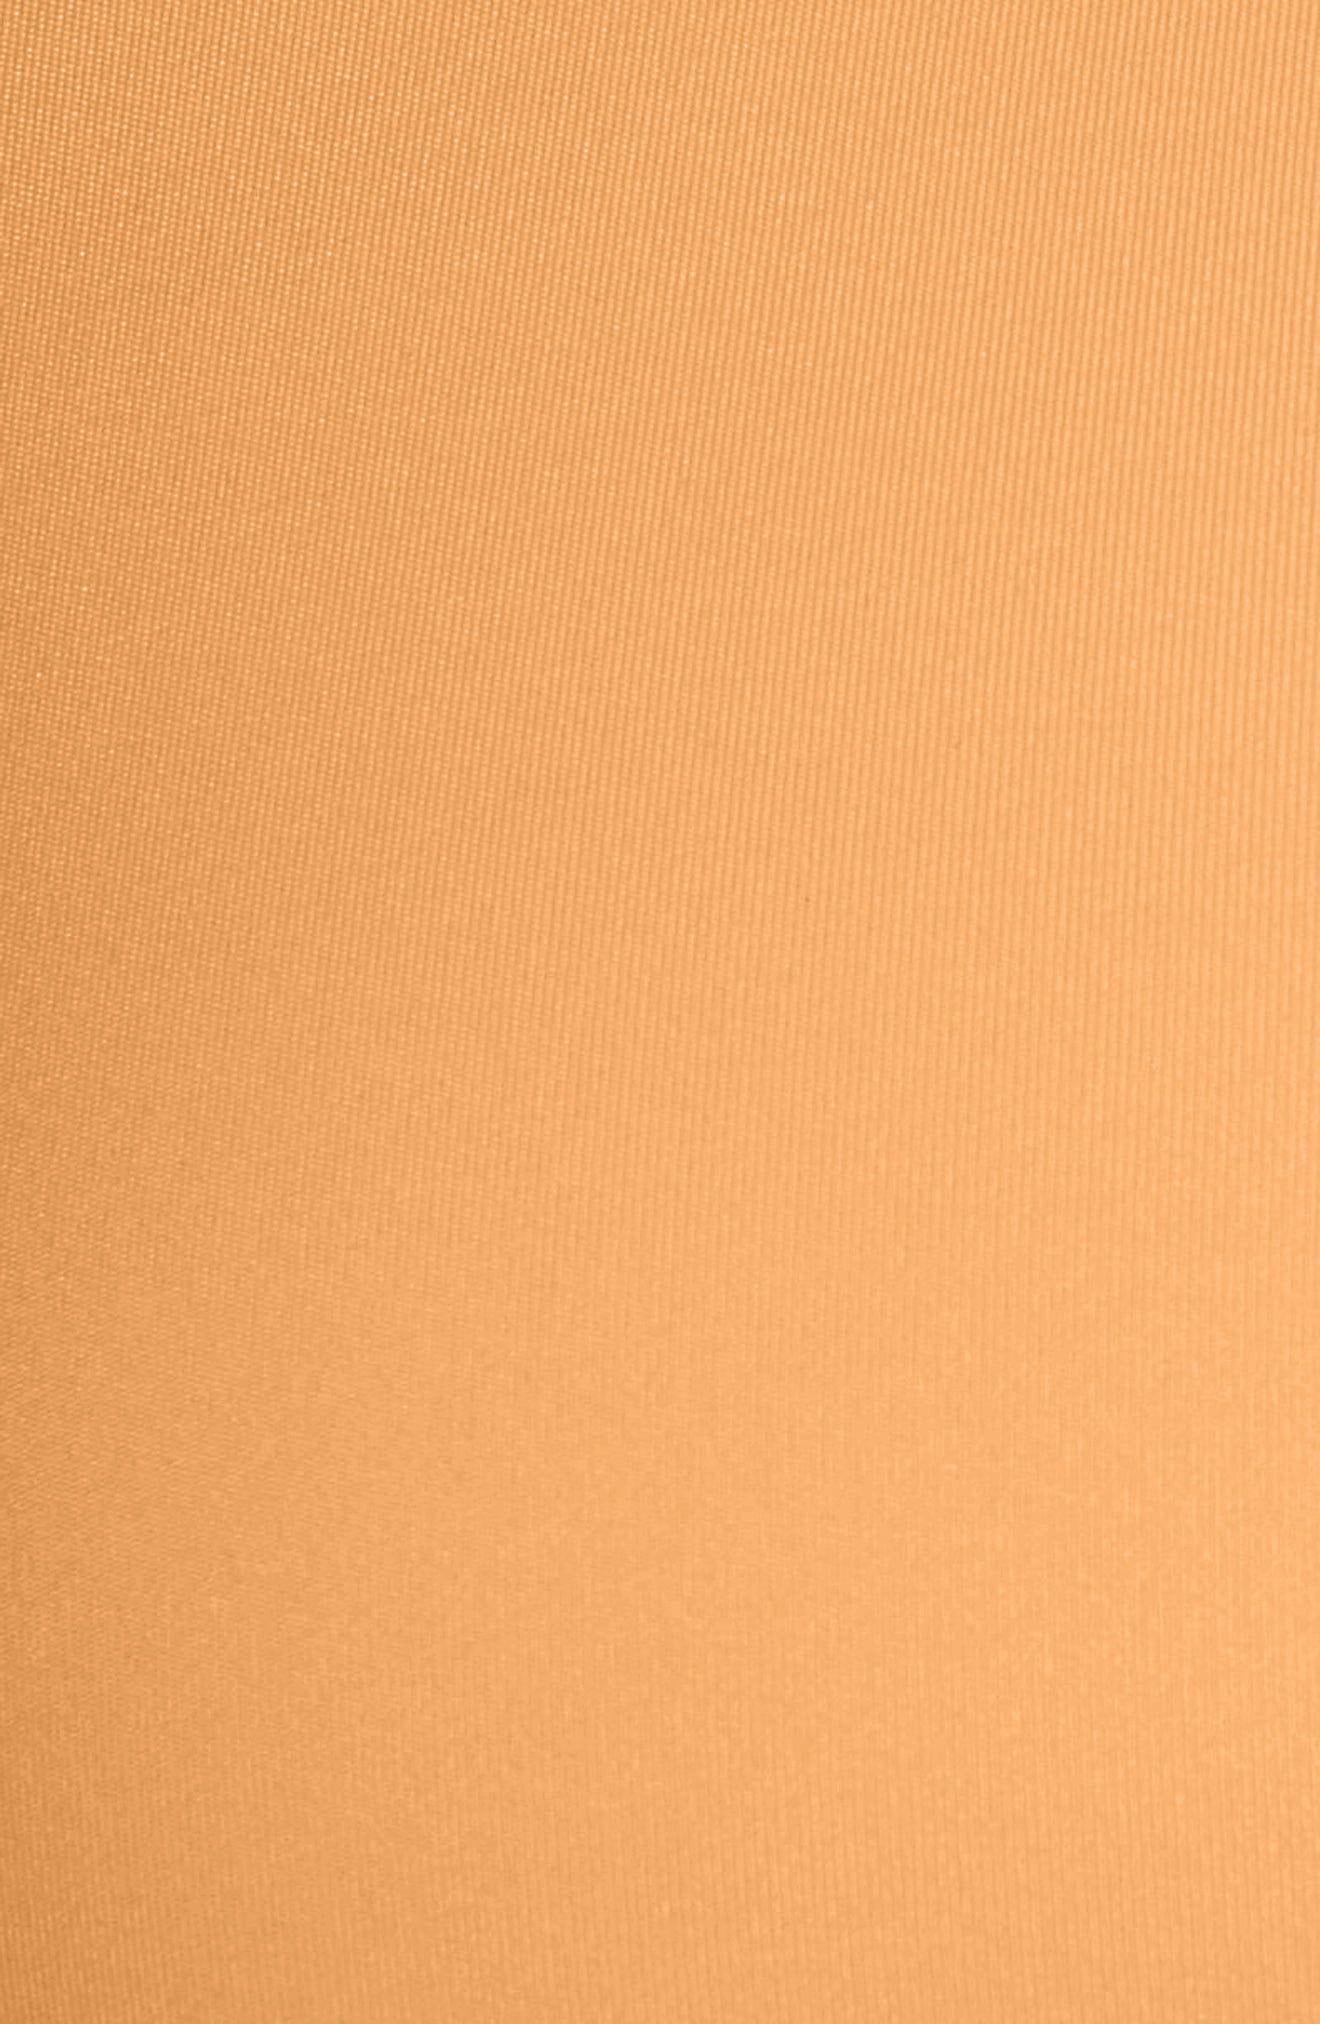 Women's Jordan Jumpman Sports Bra, Size Medium - Orange